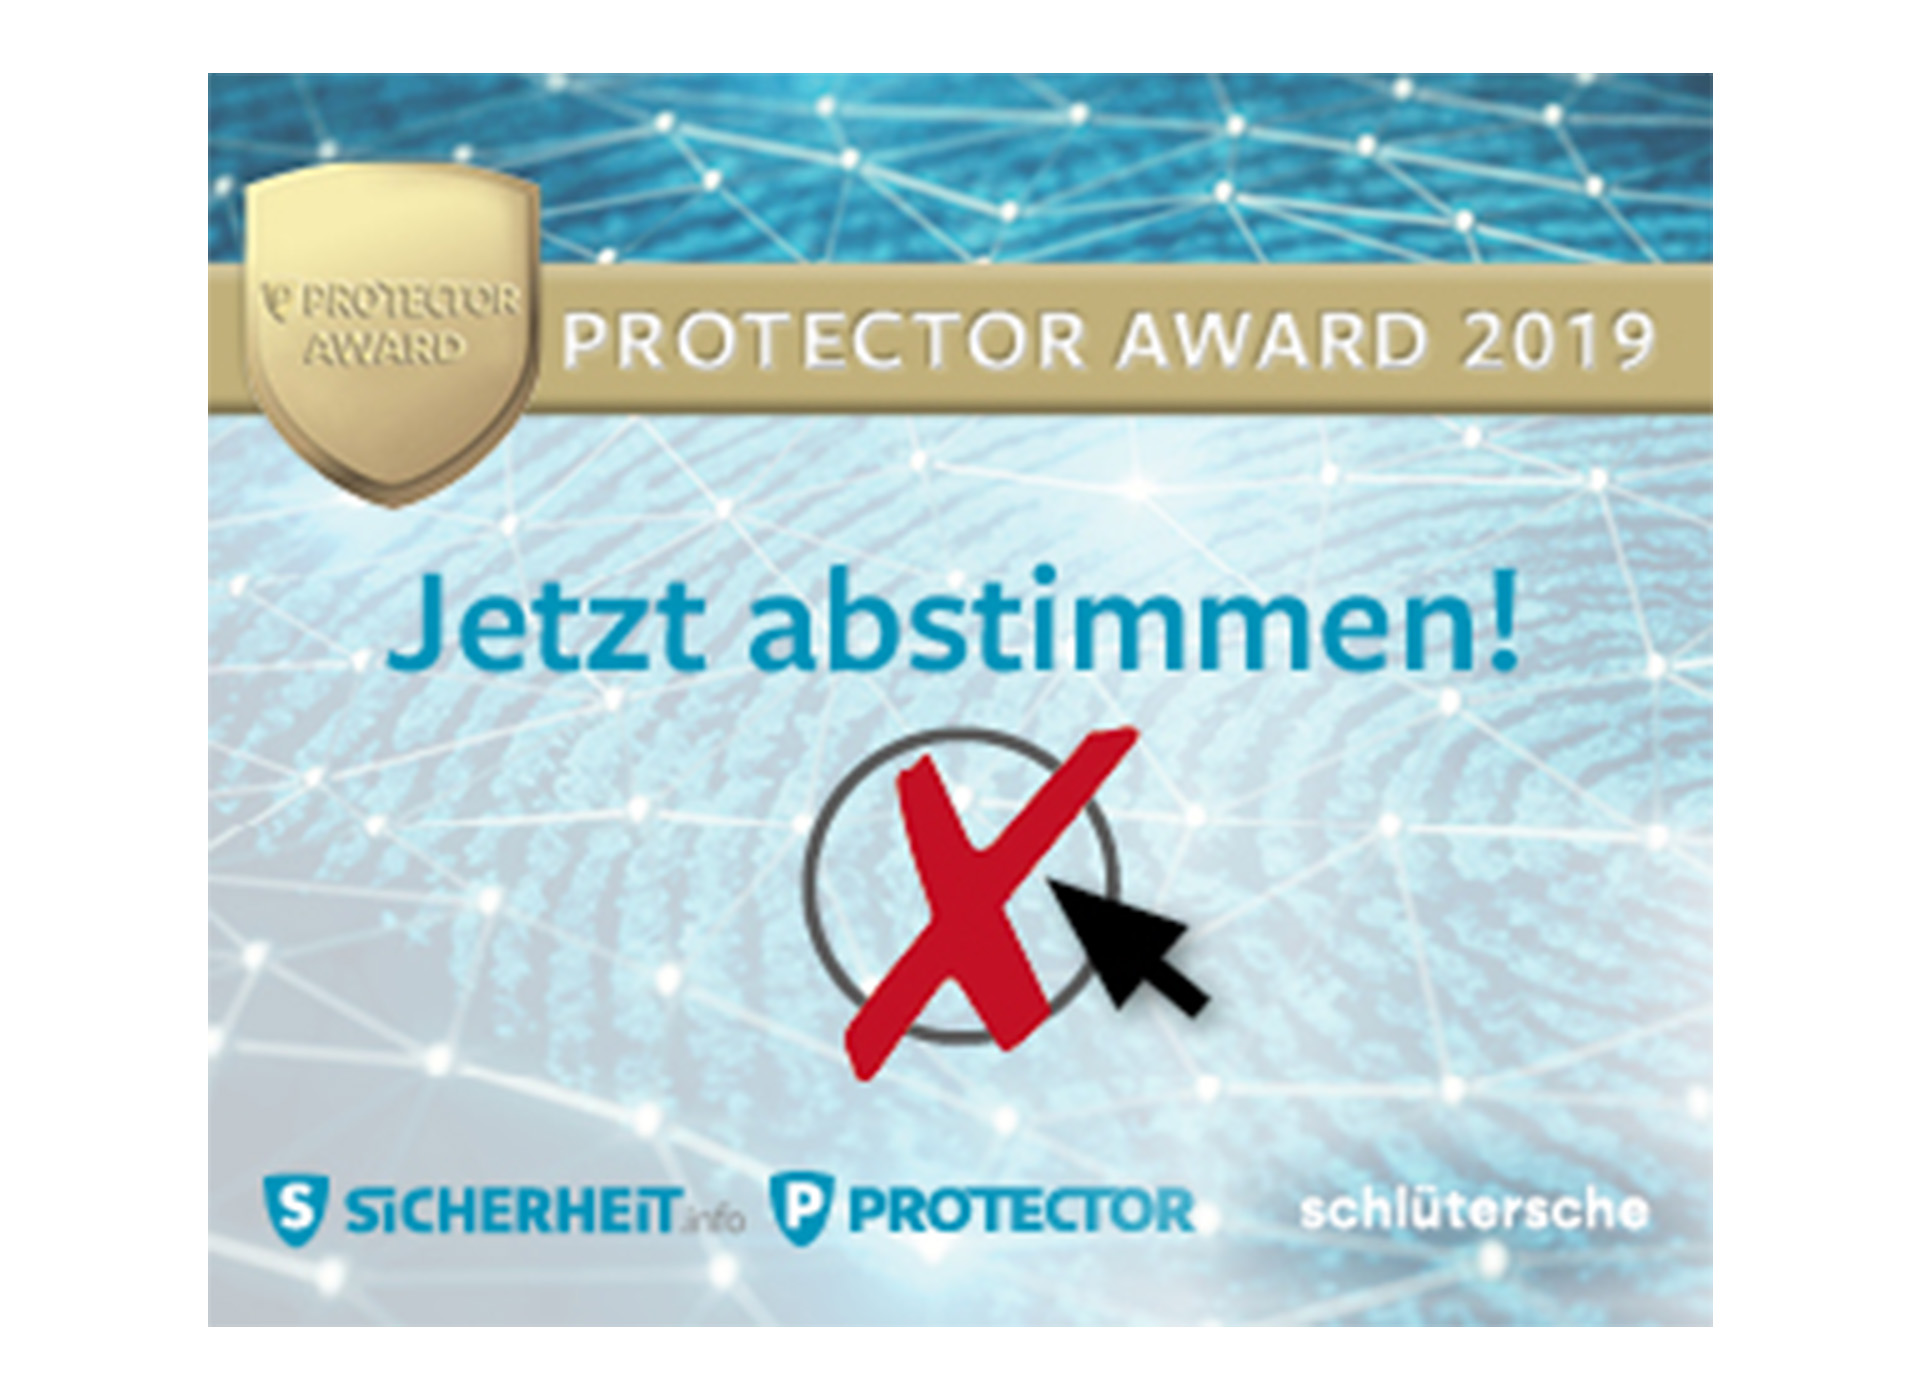 PROTECTOR AWARD 2019 (Bild: PROTECTOR,Schlütersche Verlagsgesellschaft mbH & Co. KG)